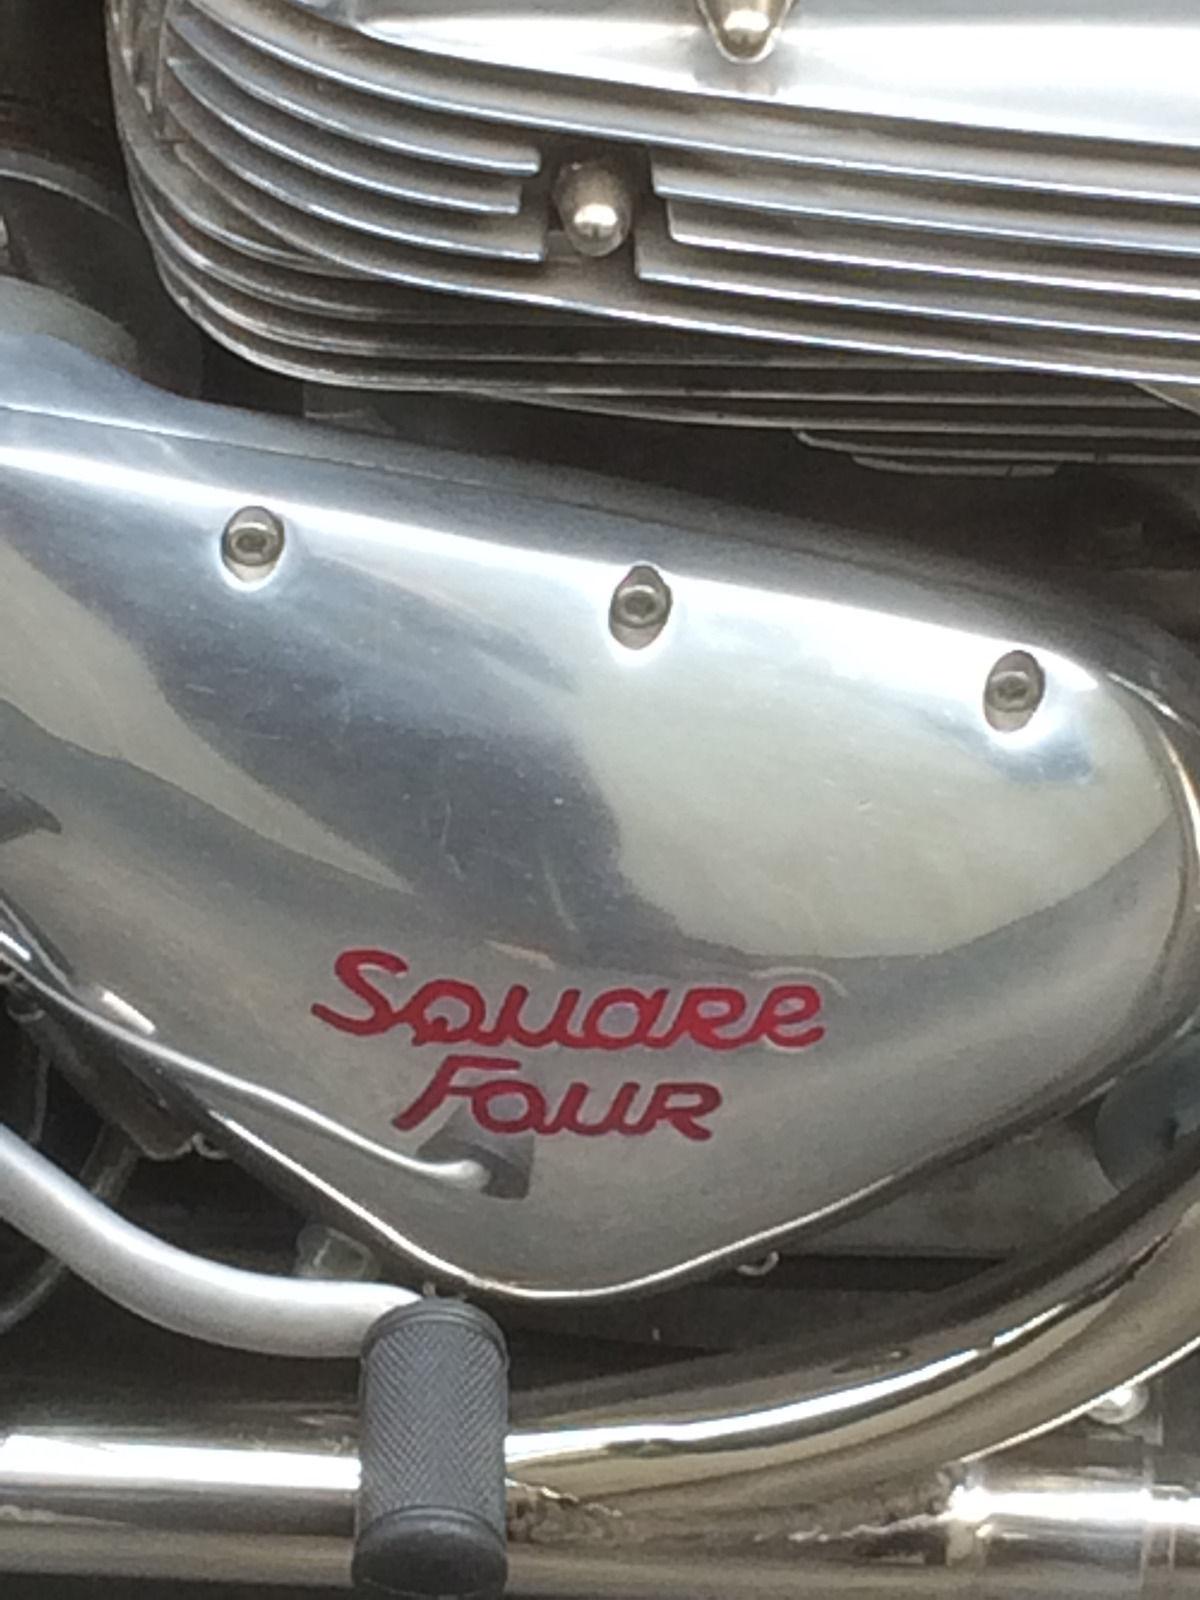 Ariel Square Four - 1957